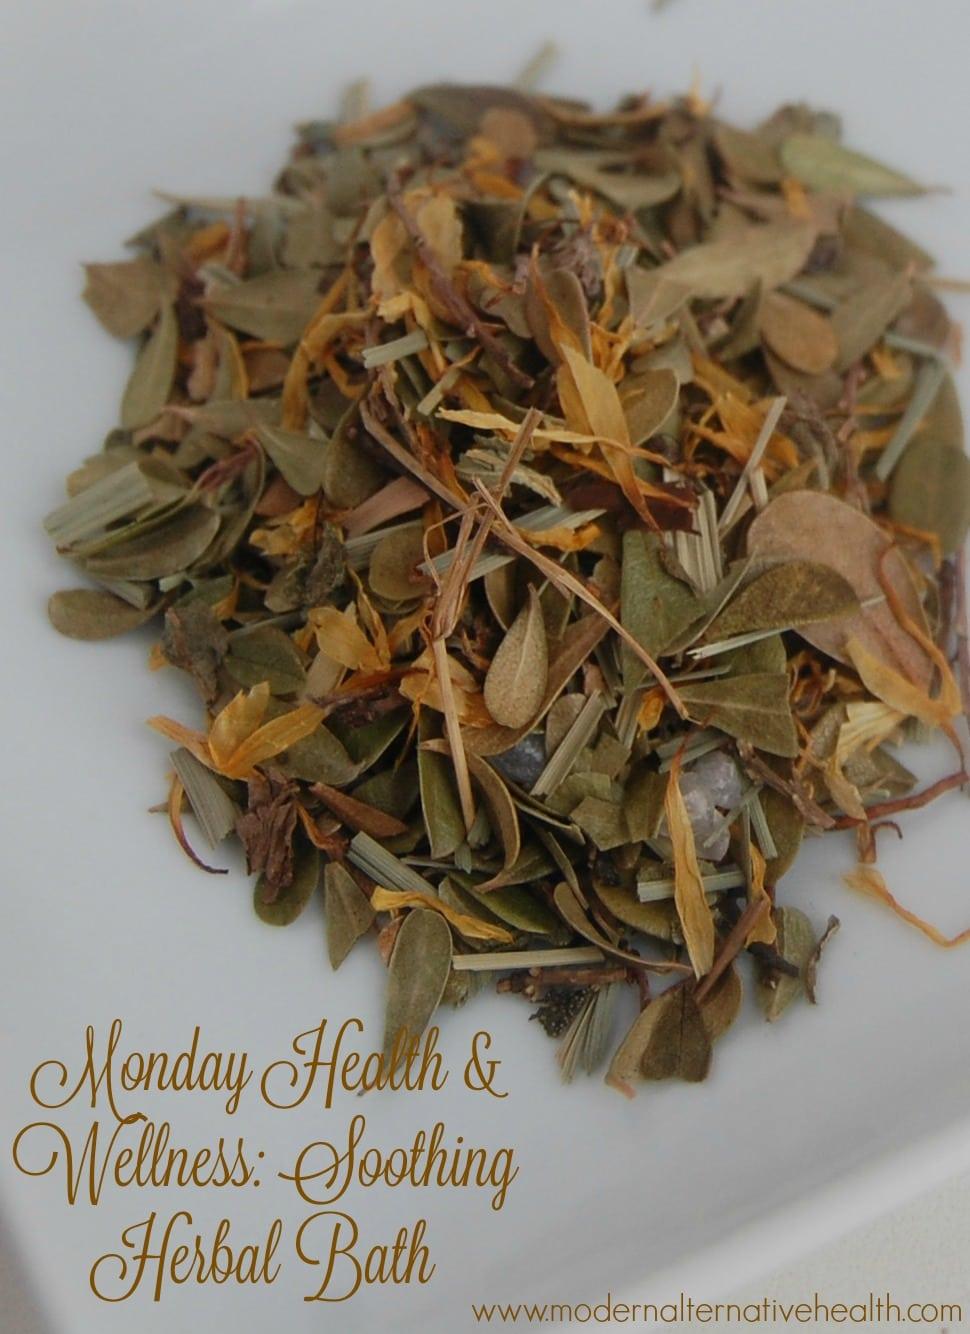 Monday Health & Wellness Soothing Herbal Bath pinterest